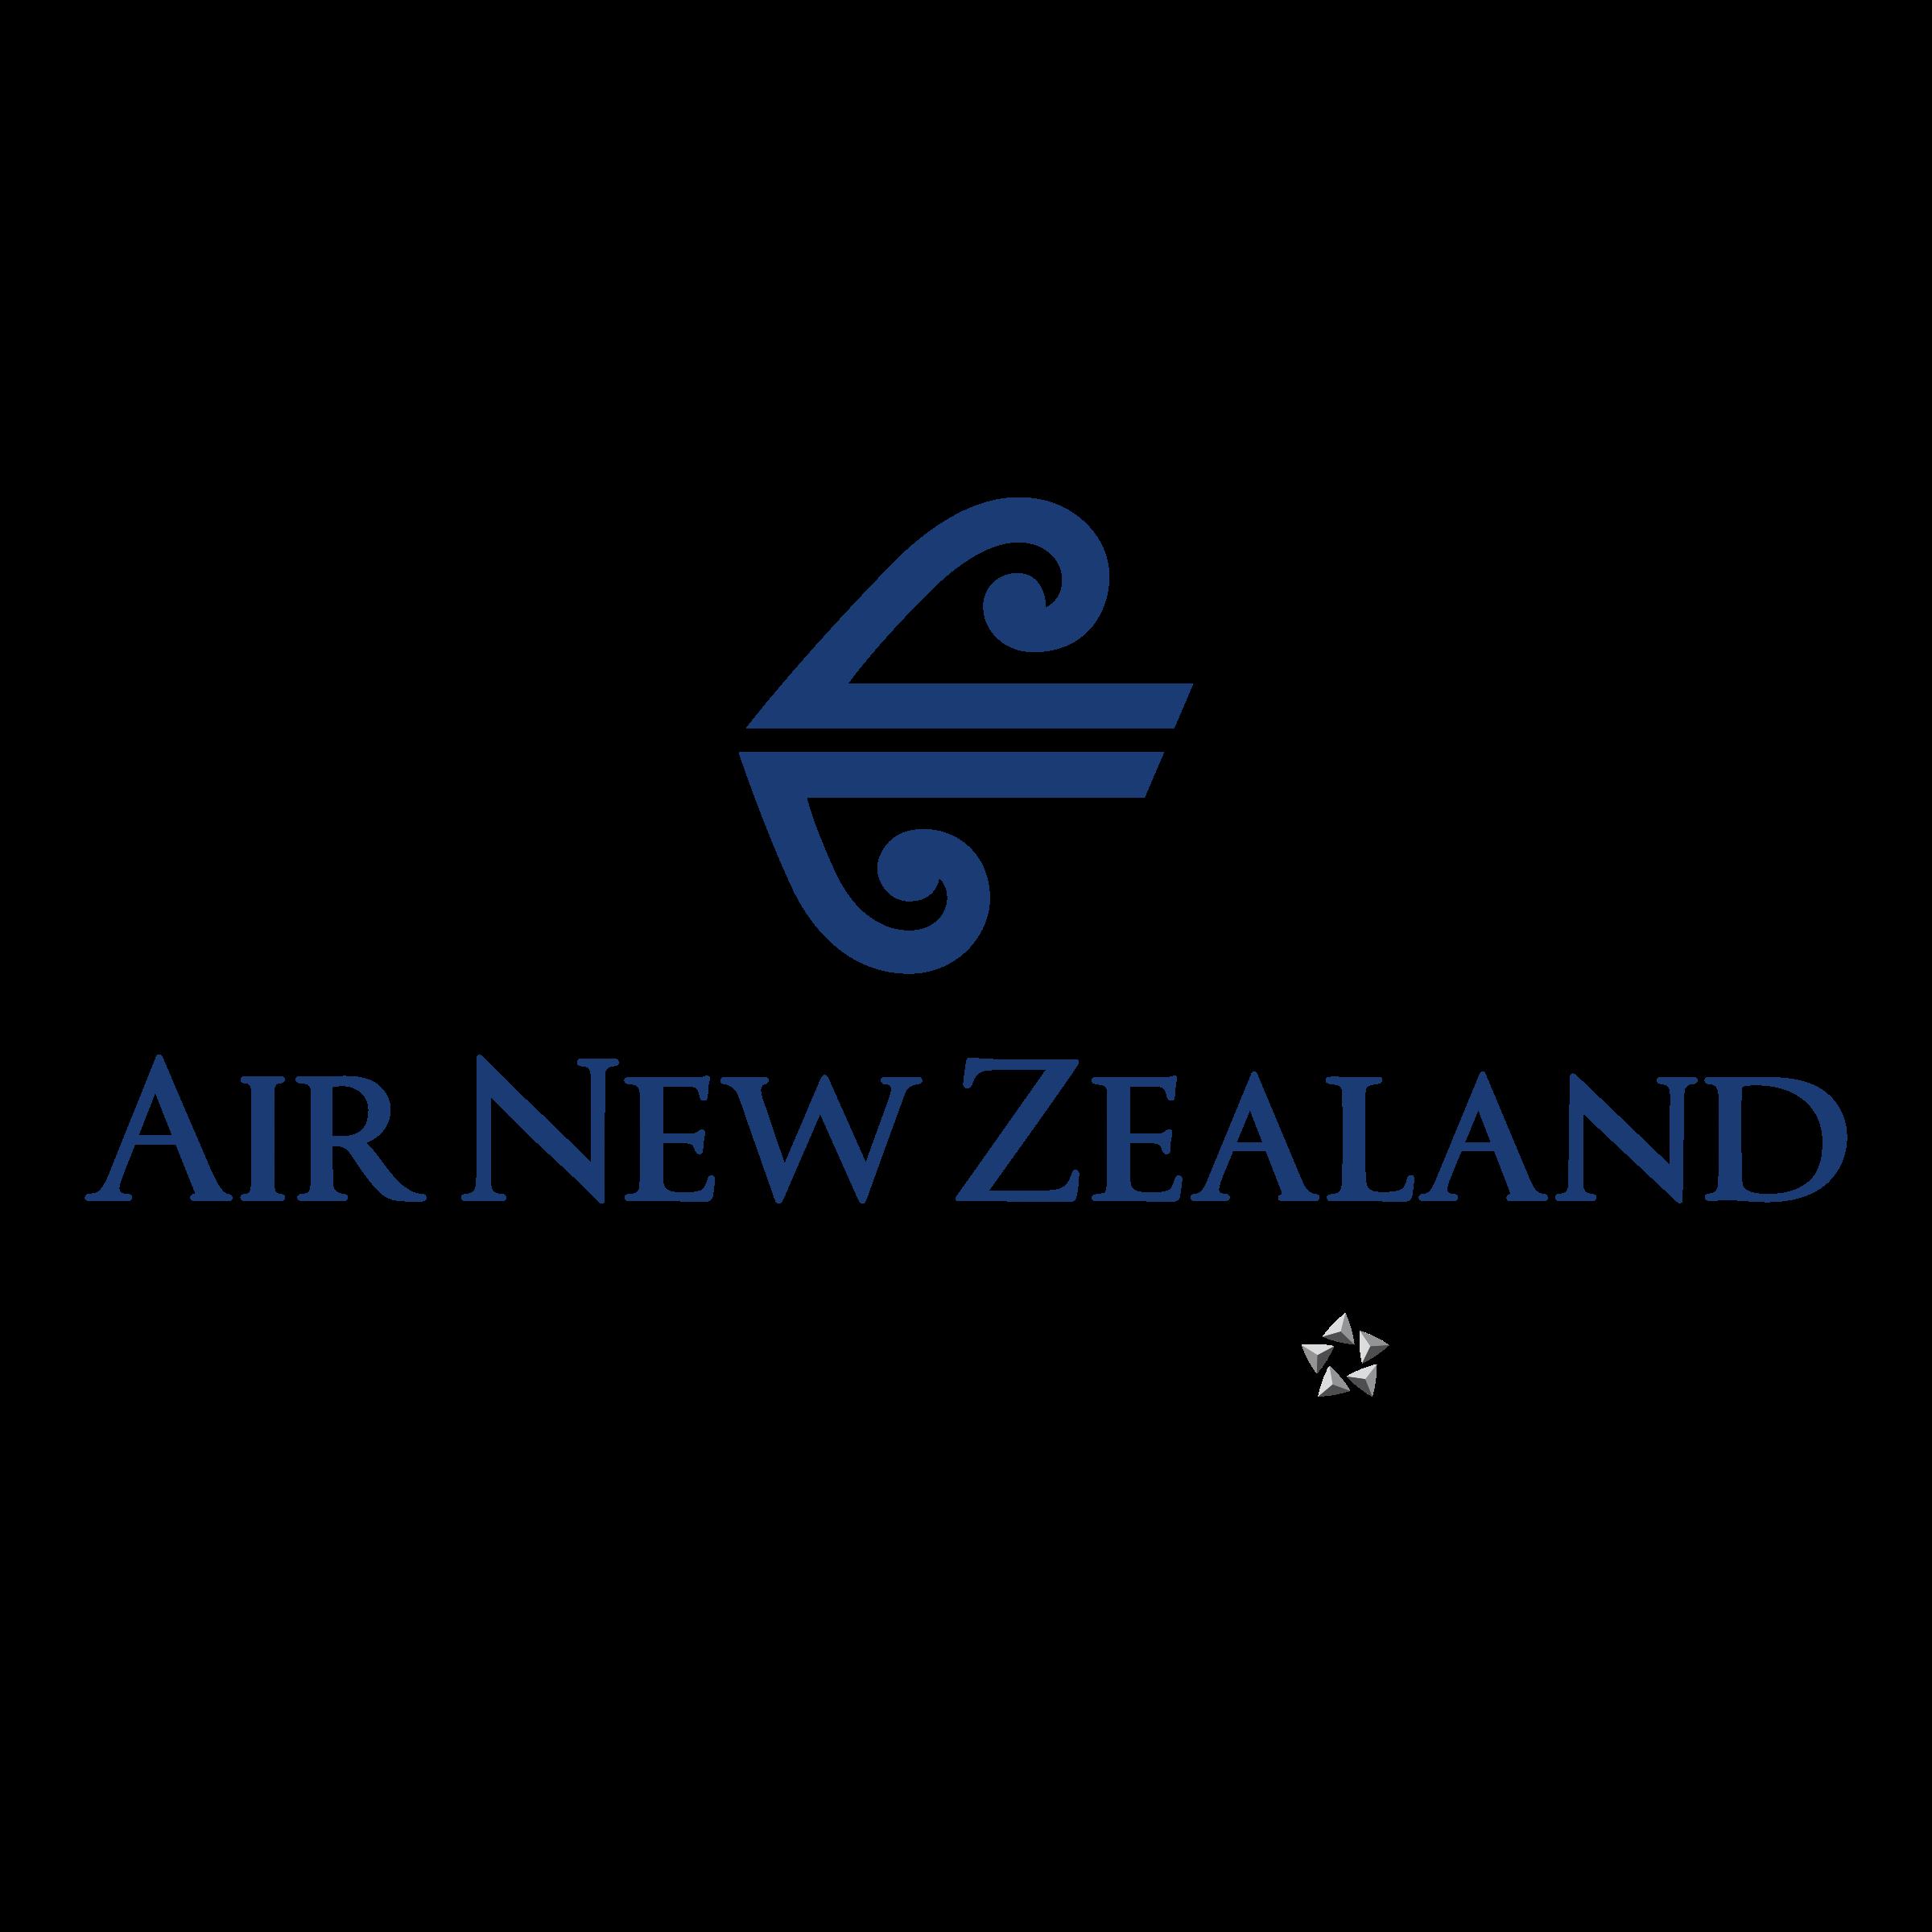 Air New Zealand 02 Logo PNG Transparent & SVG Vector.